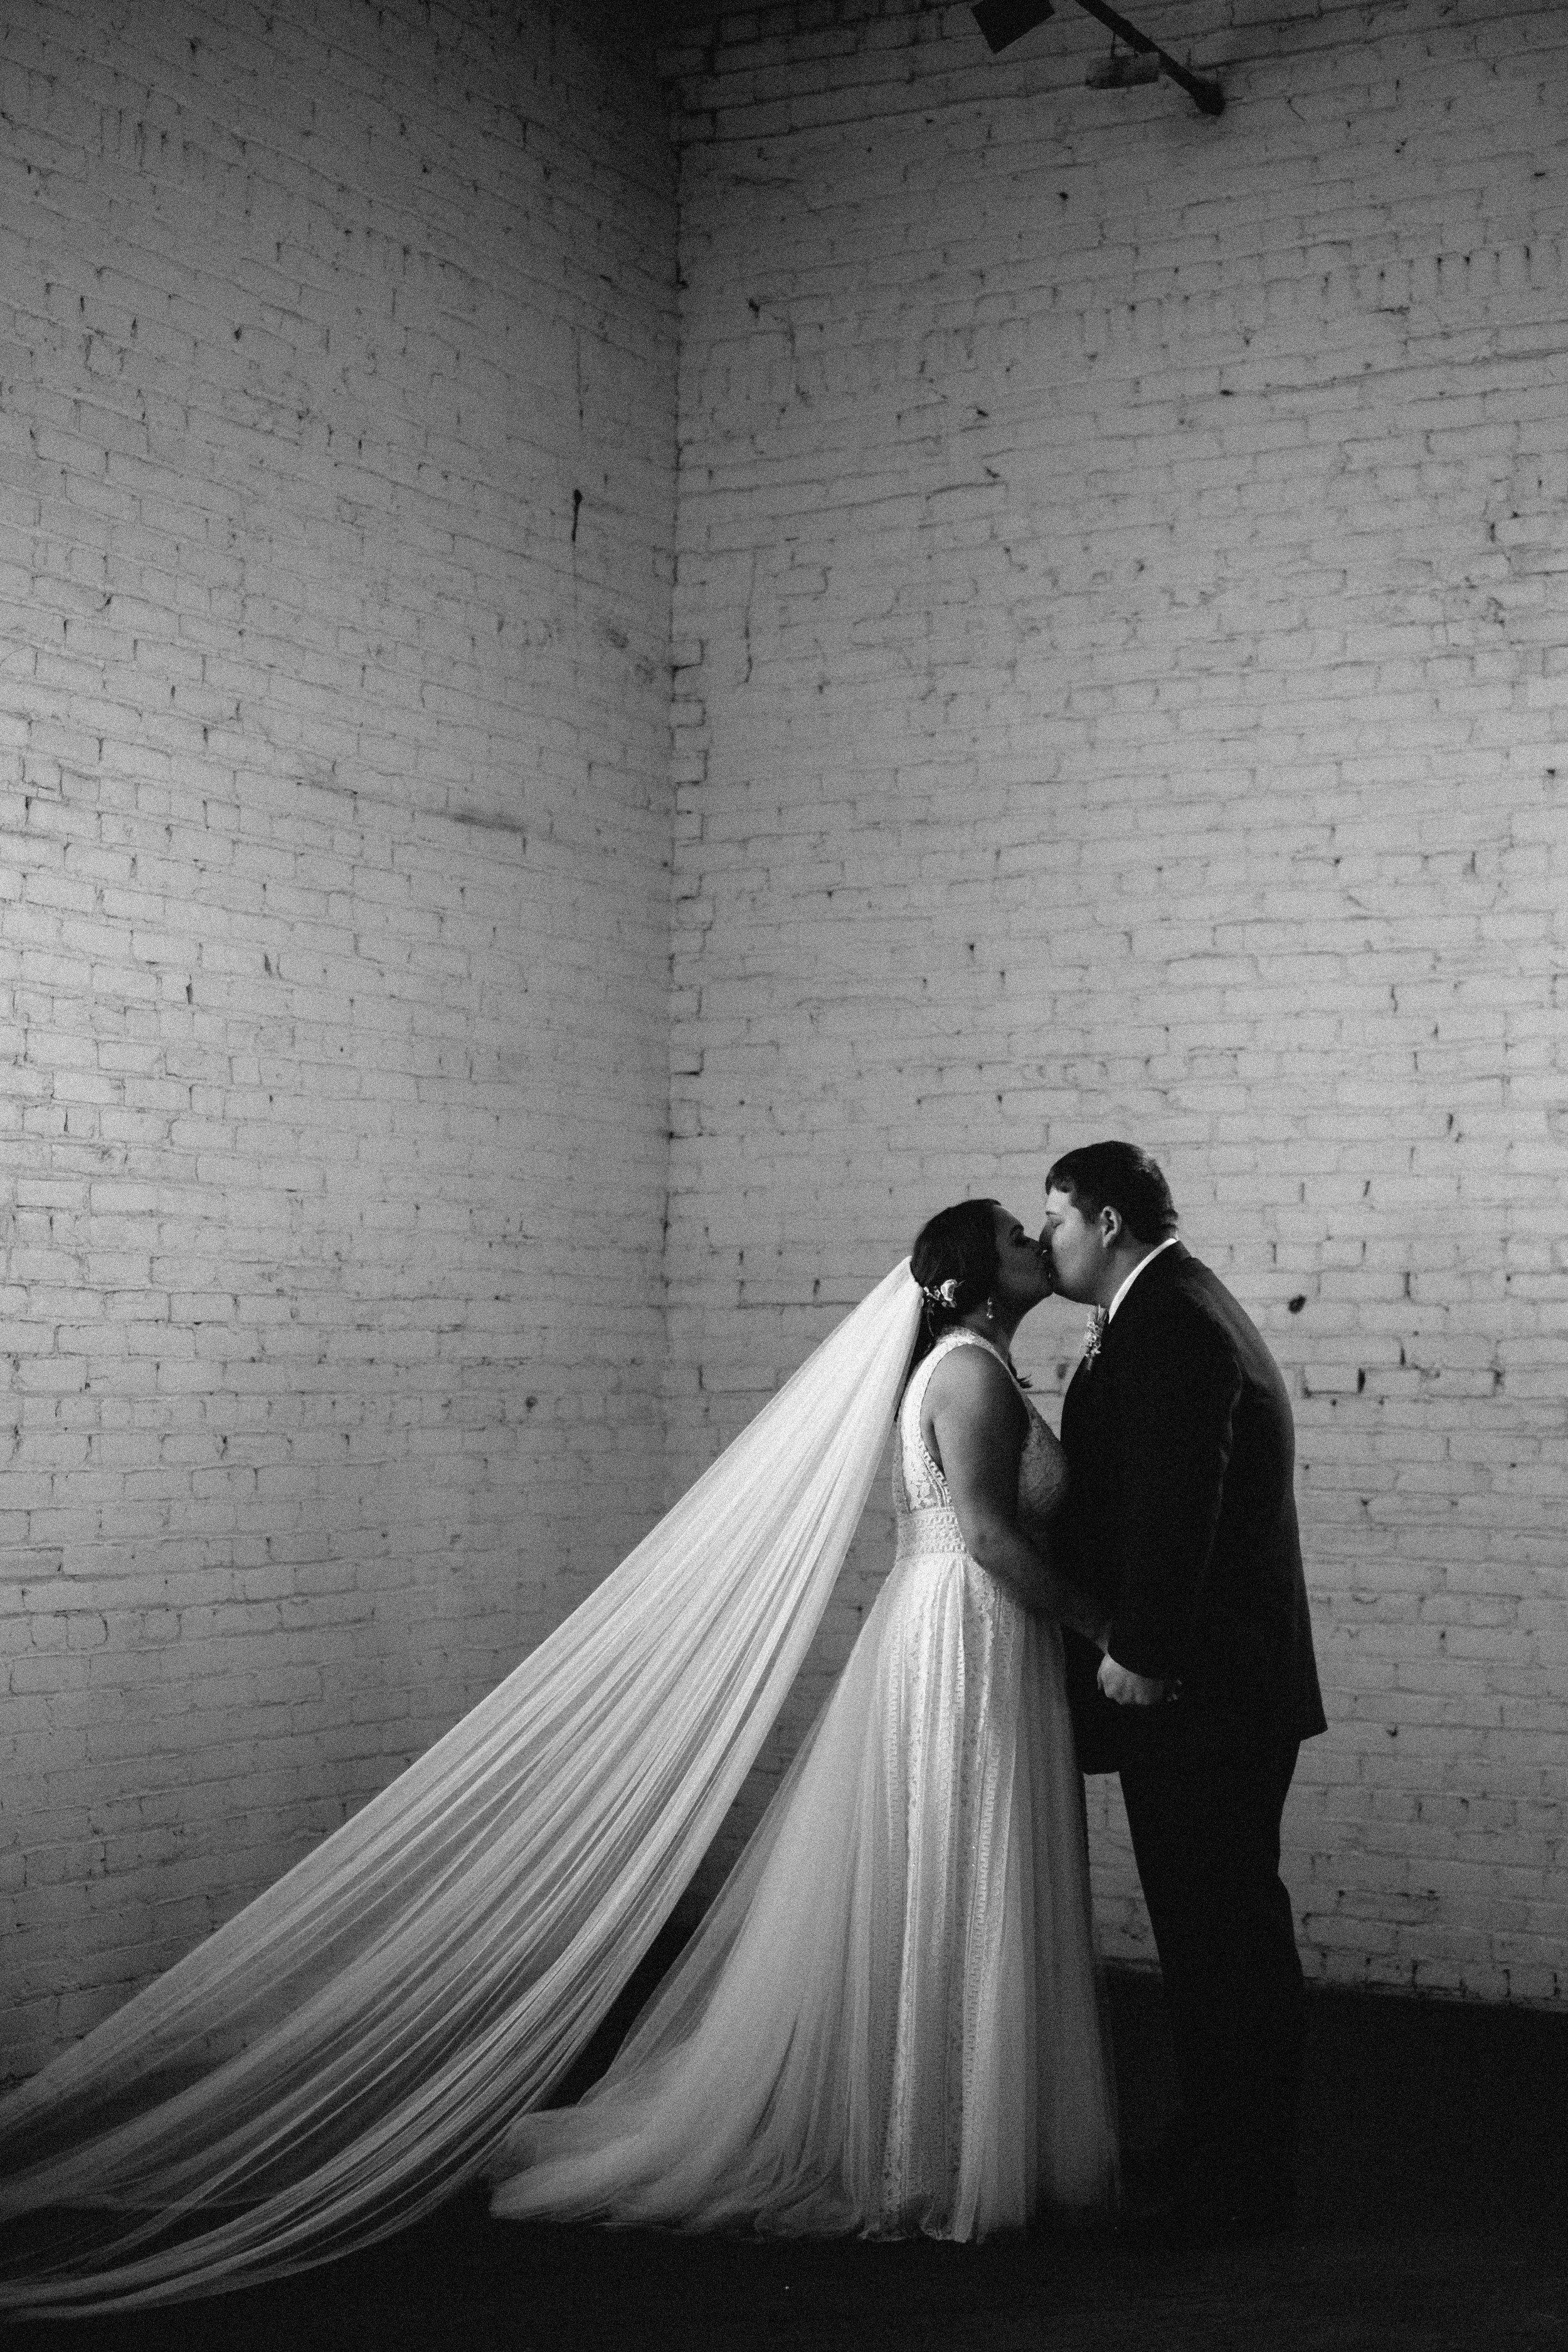 VIDEOS - WEDDING VIDEOGRAPHY STARTS AT $2800